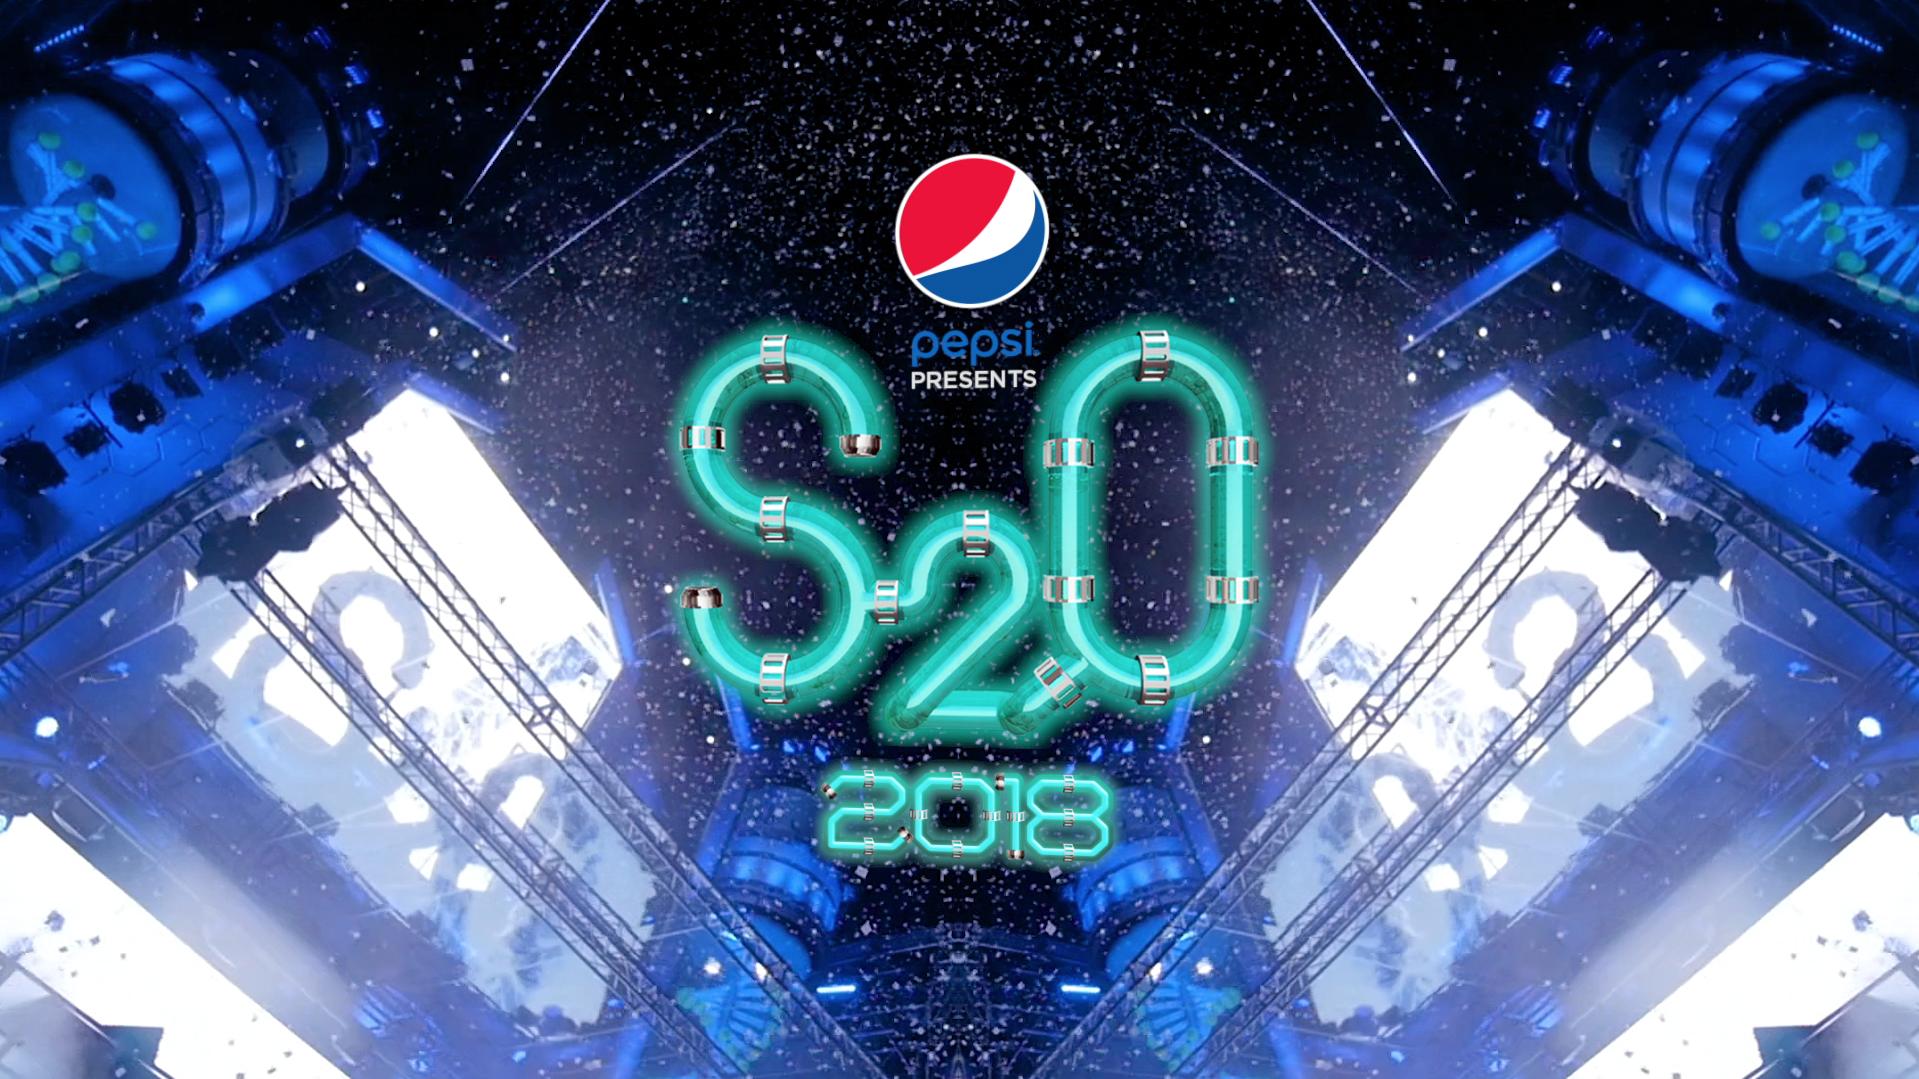 S2O BANGKOK / 2018 / Festival Aftermovie